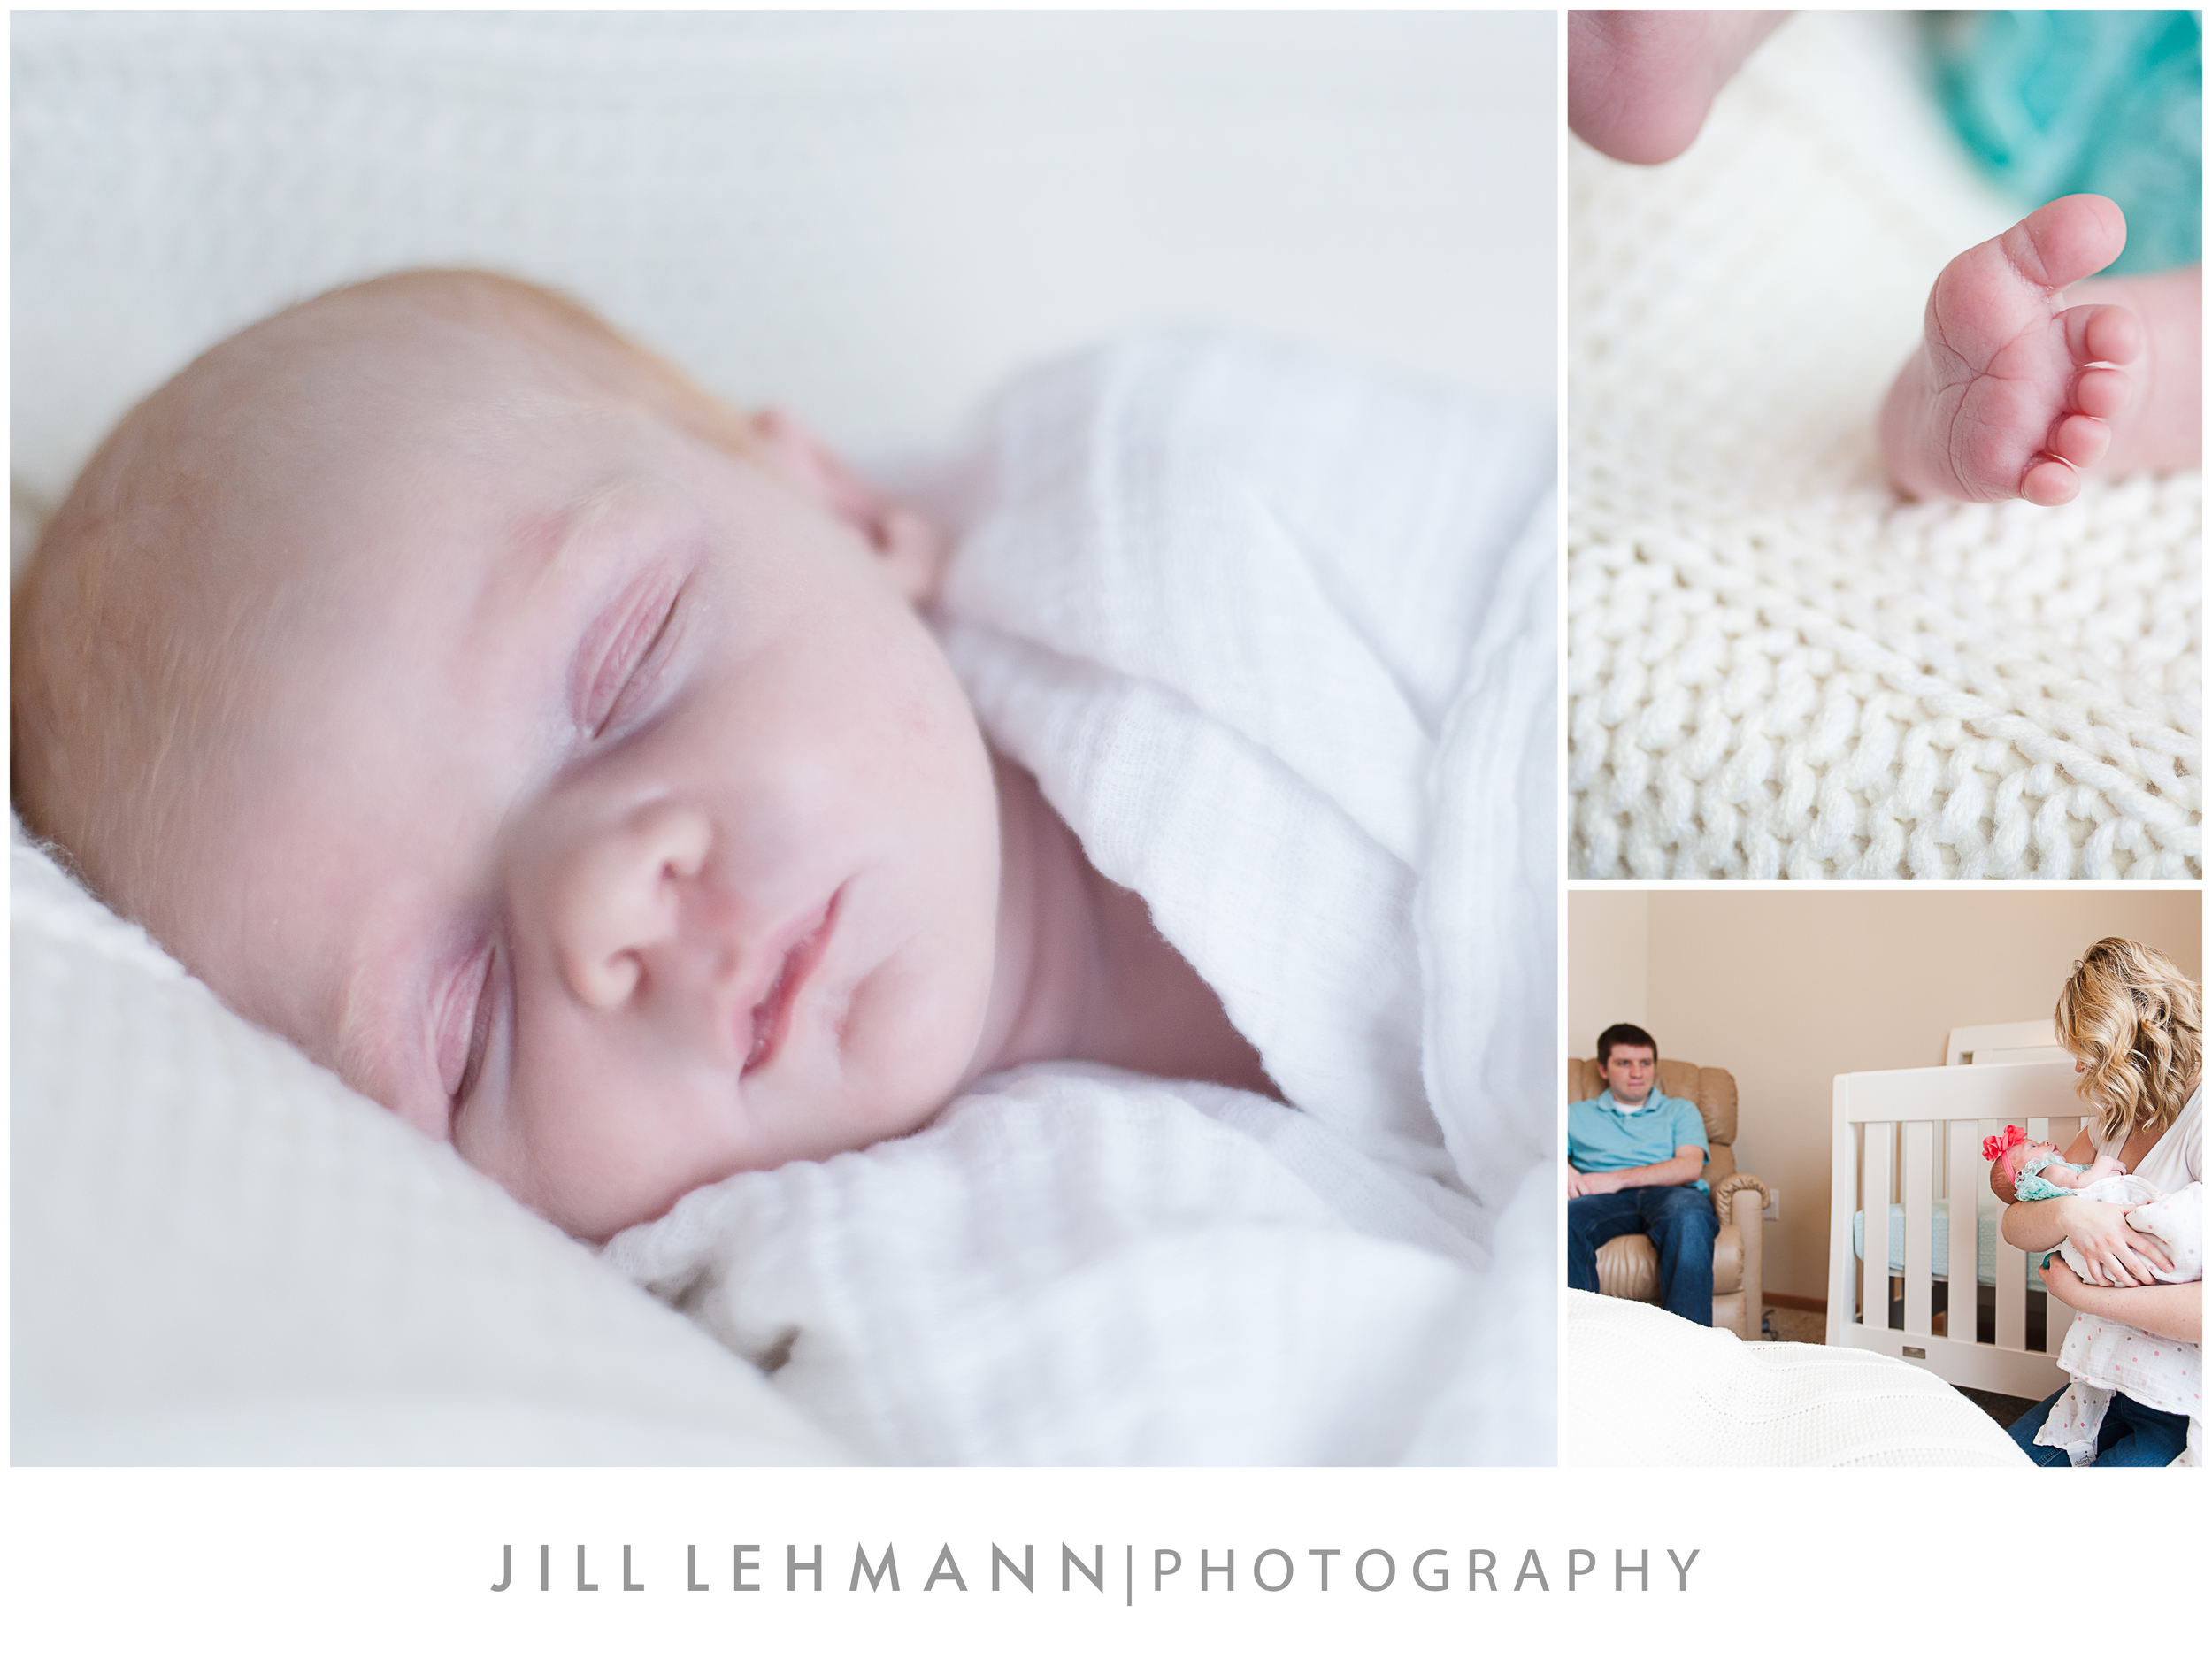 © Jill Lehmann Photography - Baby, Newborn Photography in Des Moines, IA